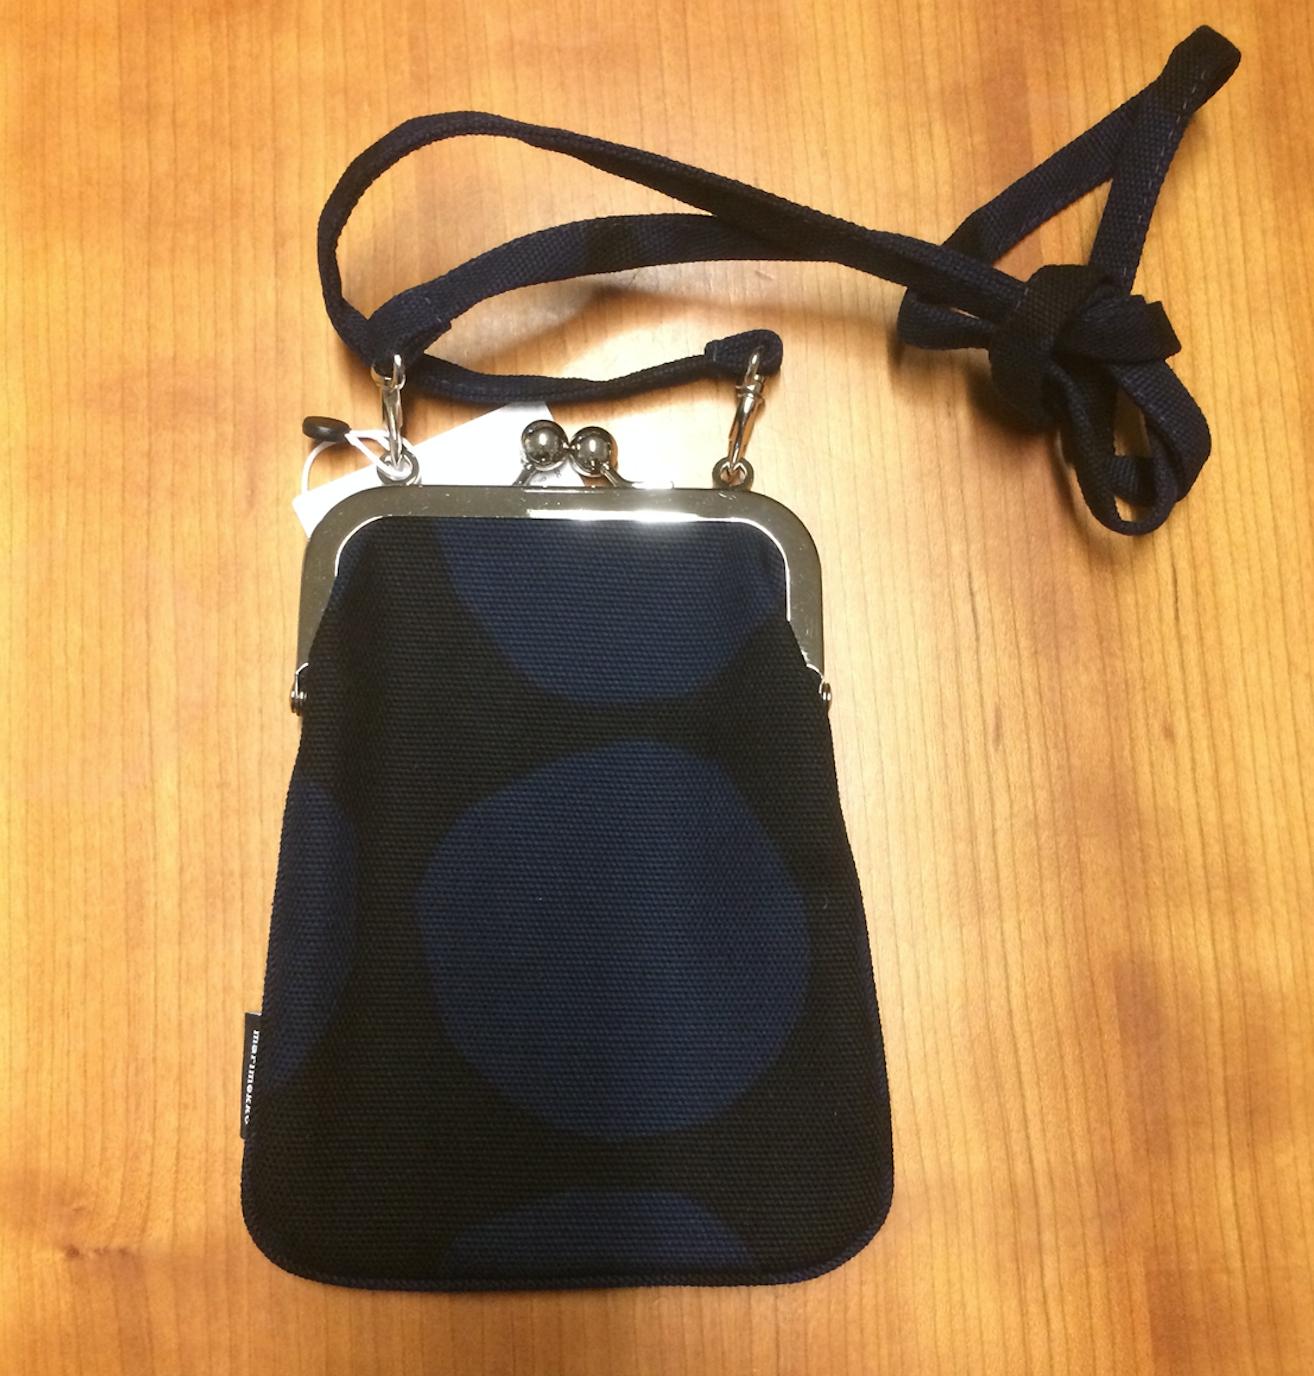 Marimekko Rimmi bourse sac, de la Finlande Neuf avec étiquettes, bleu pienet kivet